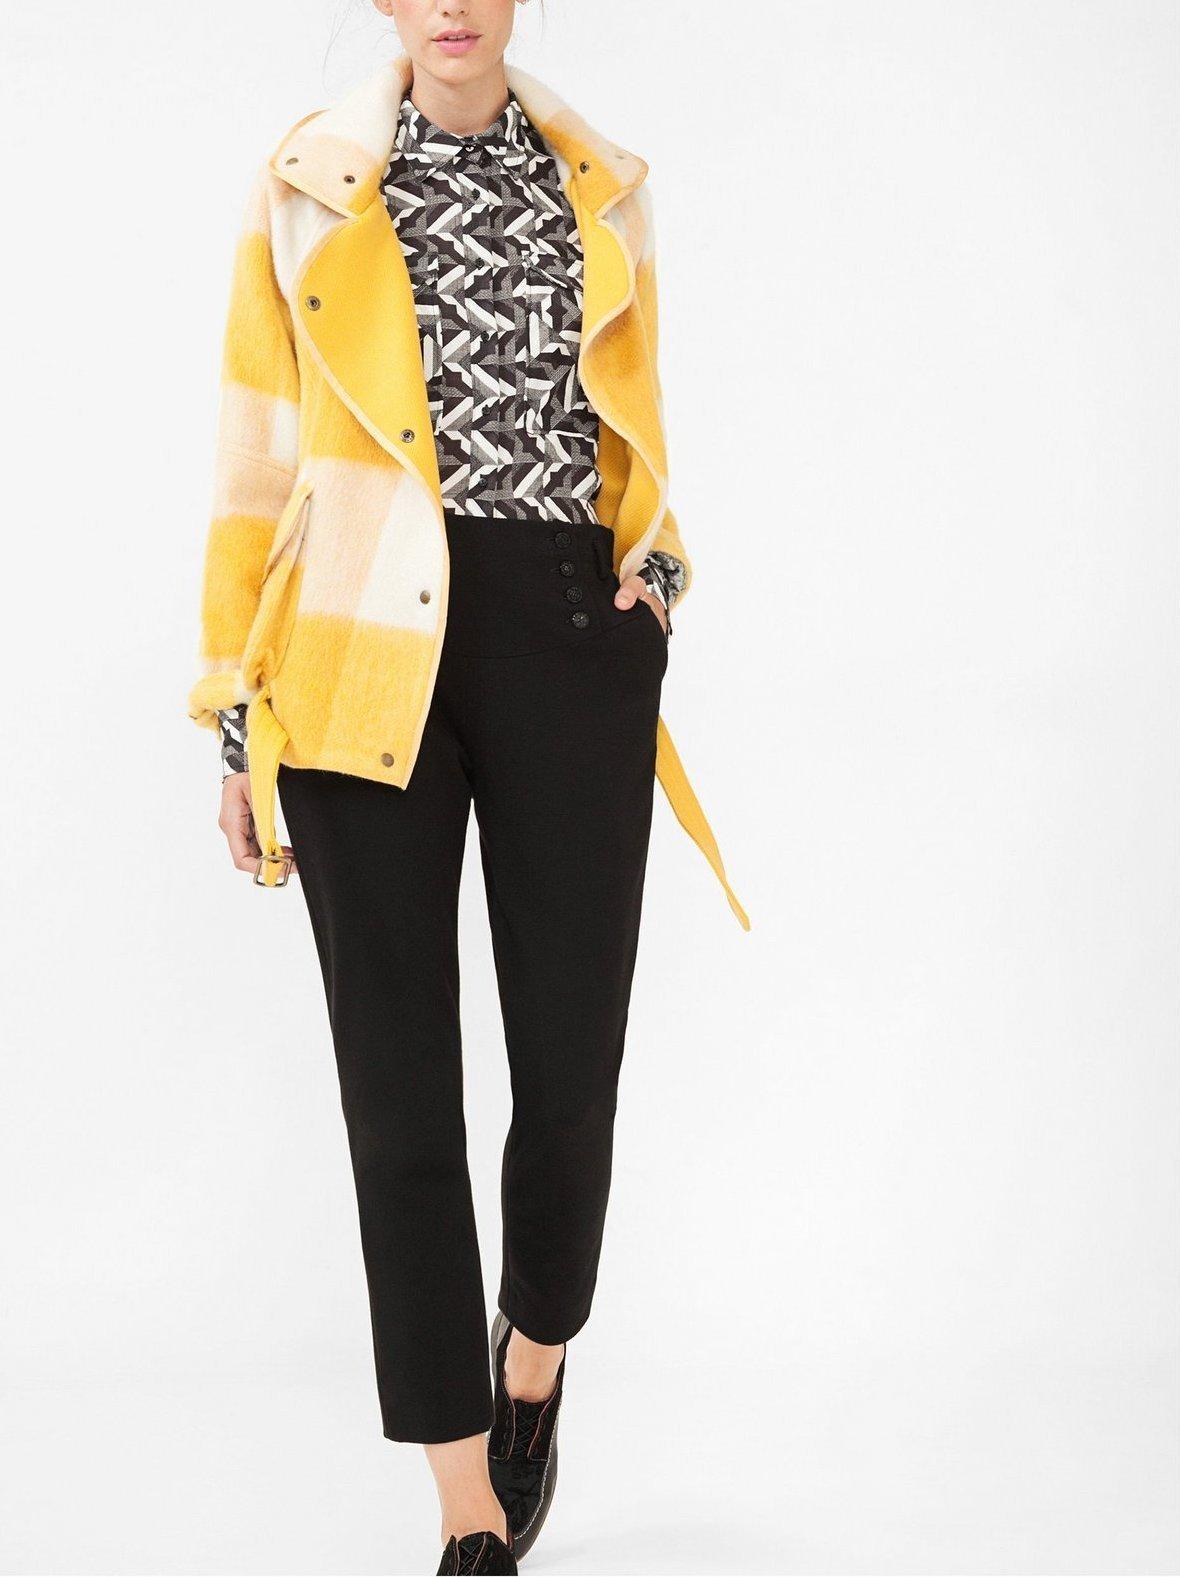 Womens Yellow Plaid Coat Black And White Print Dress Shirt Black